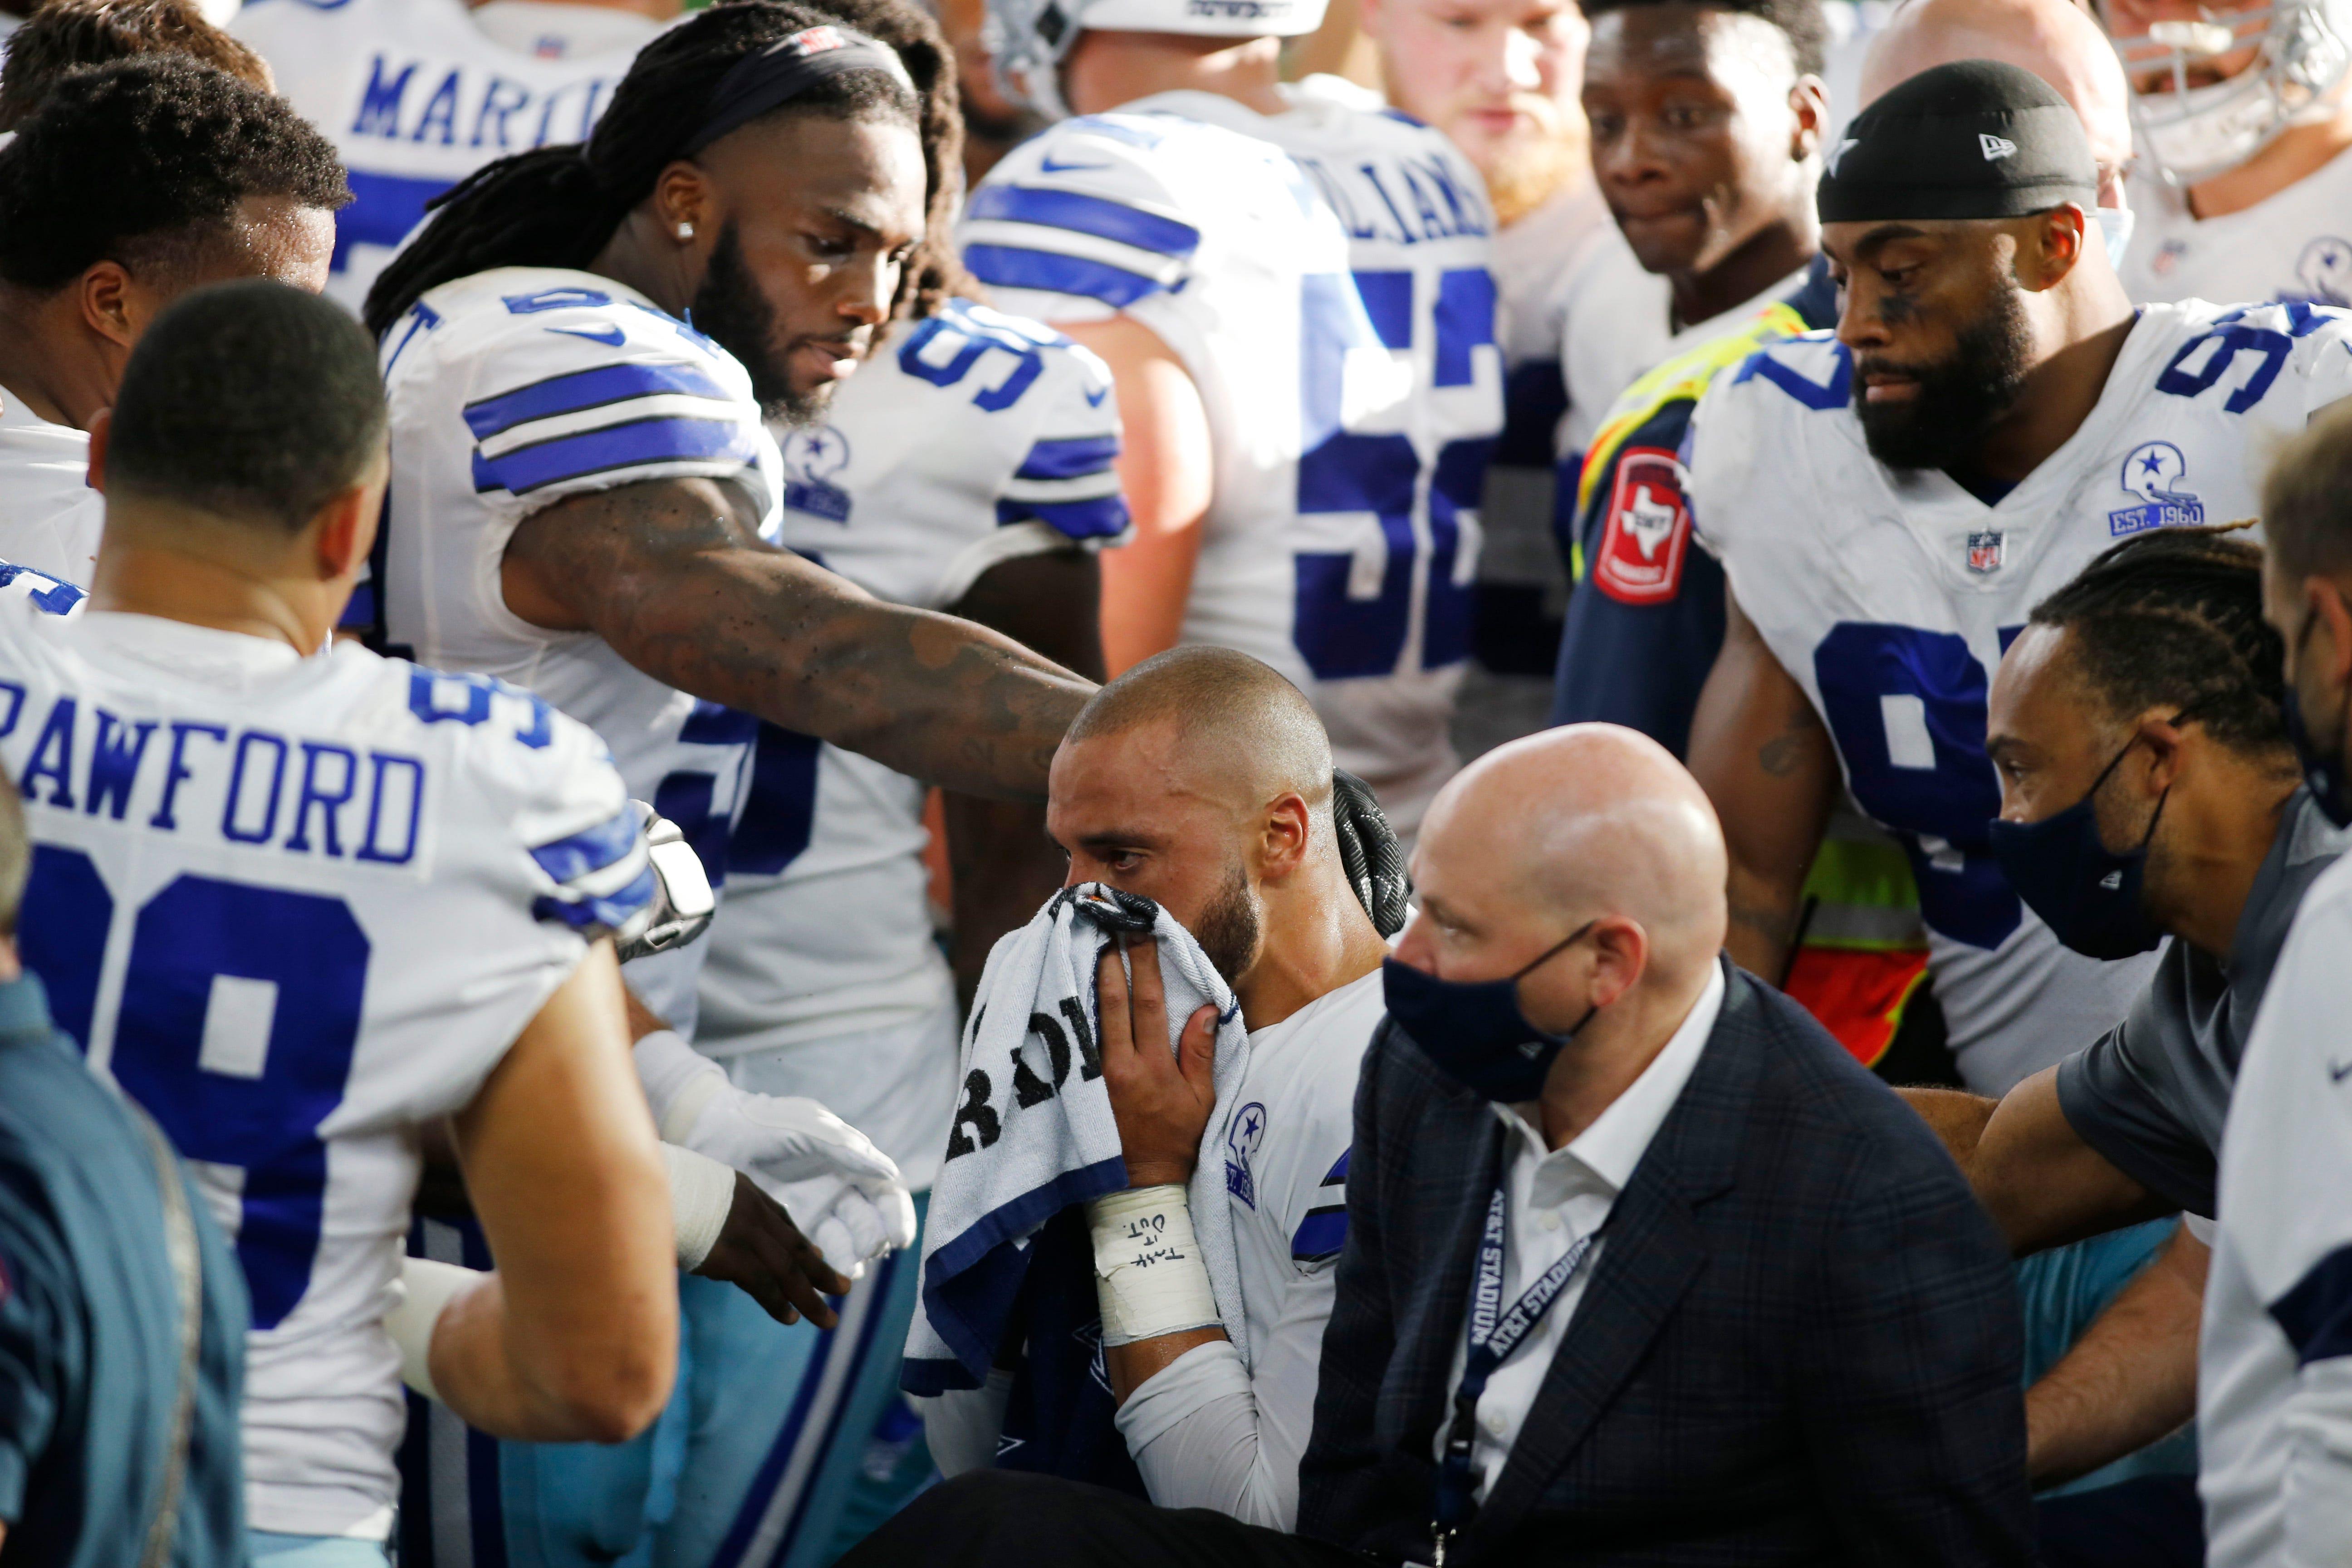 Opinion: Jerry Jones has plenty to set right with Dak Prescott after Cowboys QB's injury